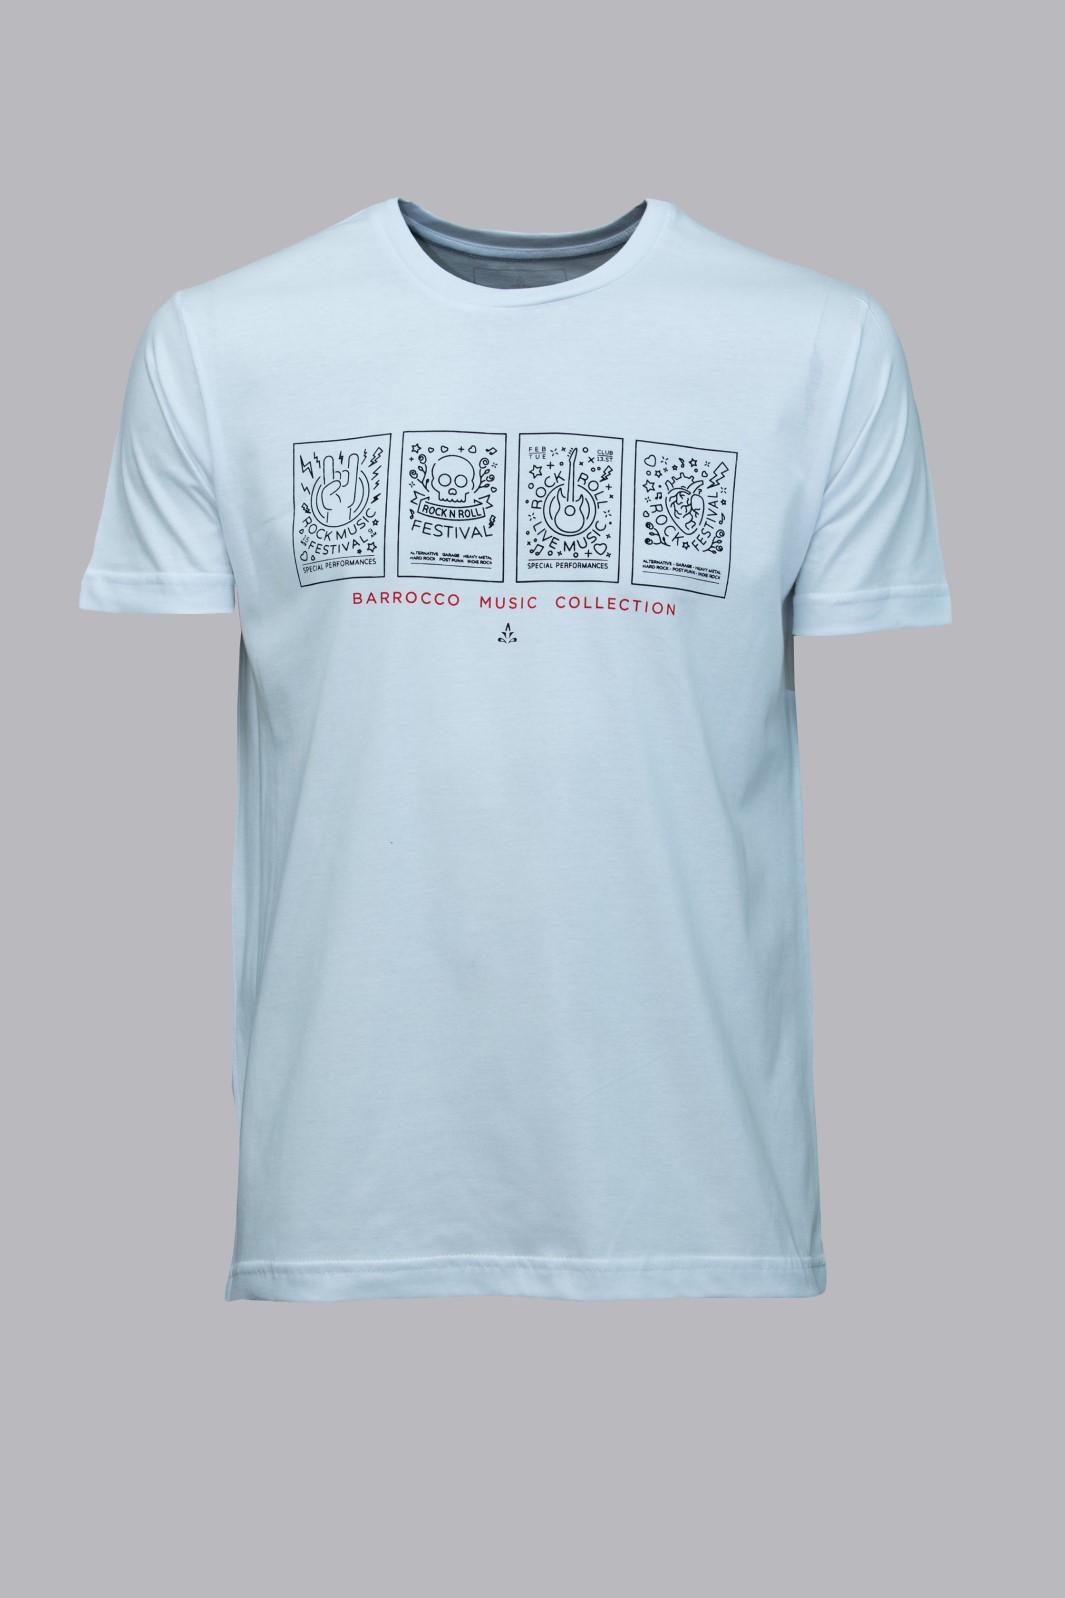 Camiseta Barrocco Music Collection